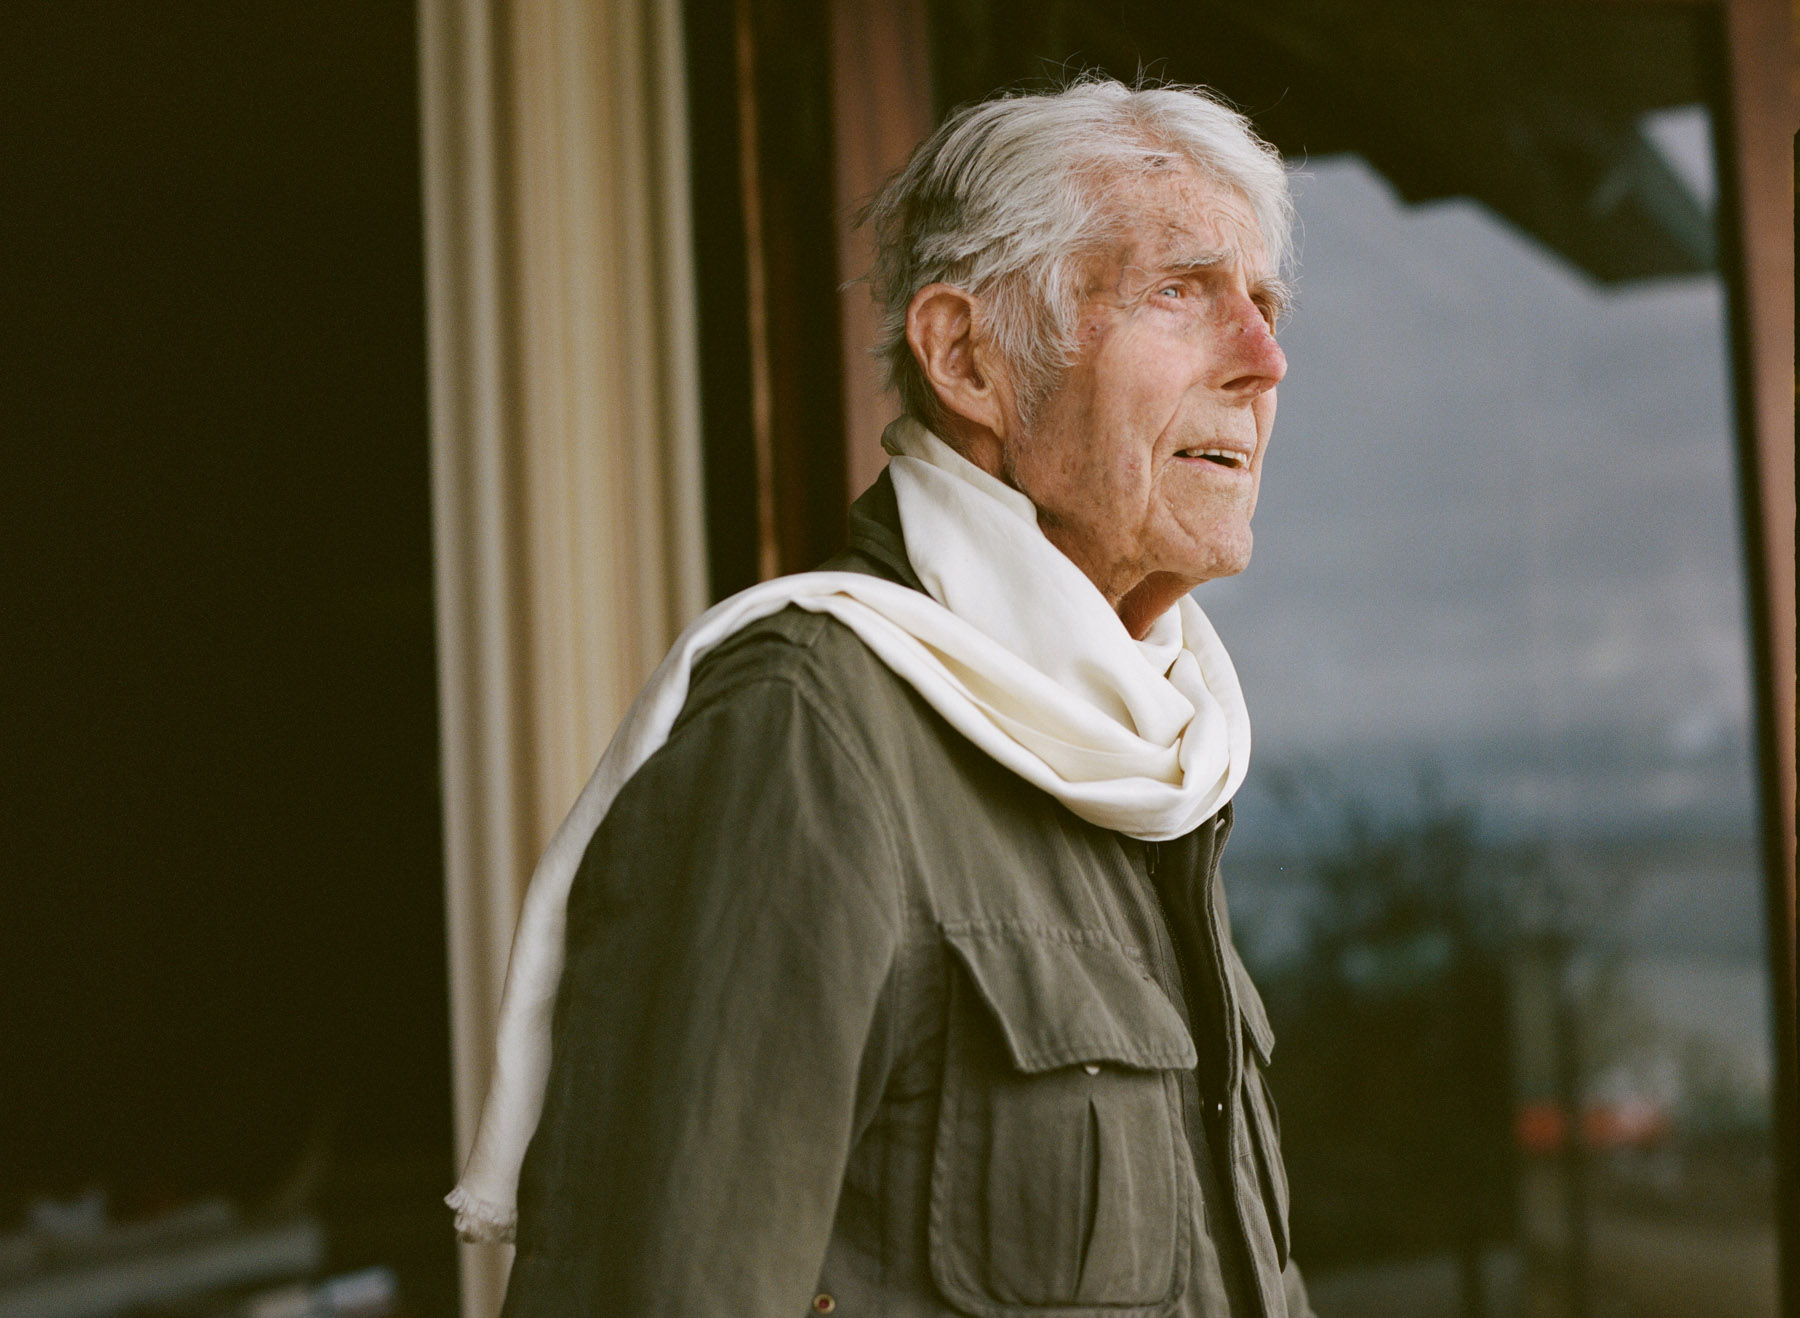 Harry Gesner, Justin Chung, Architecture, Malibu, California, Kodak